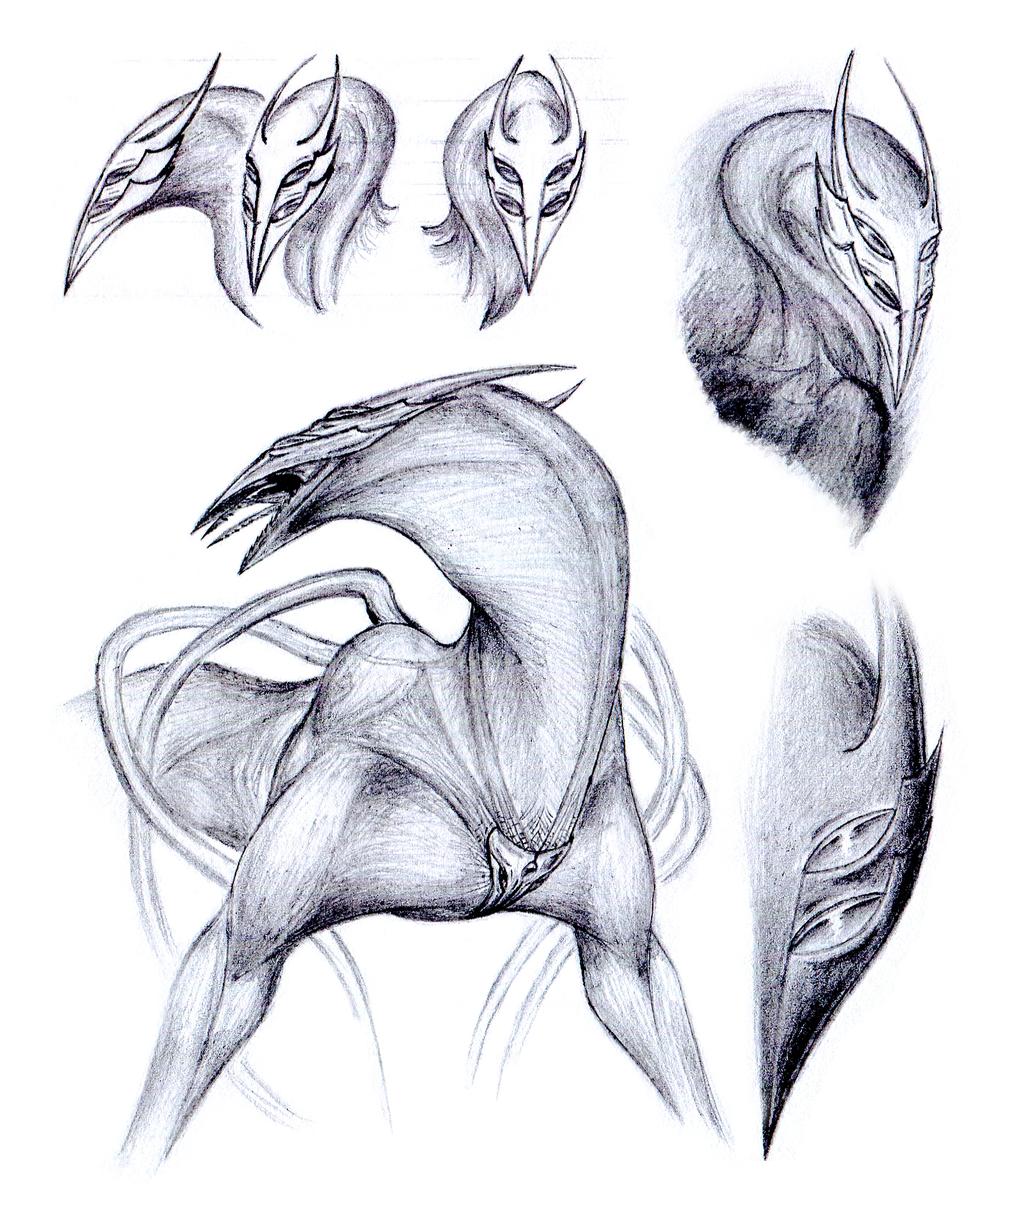 Sketchdump: Triangle by CamaroLp